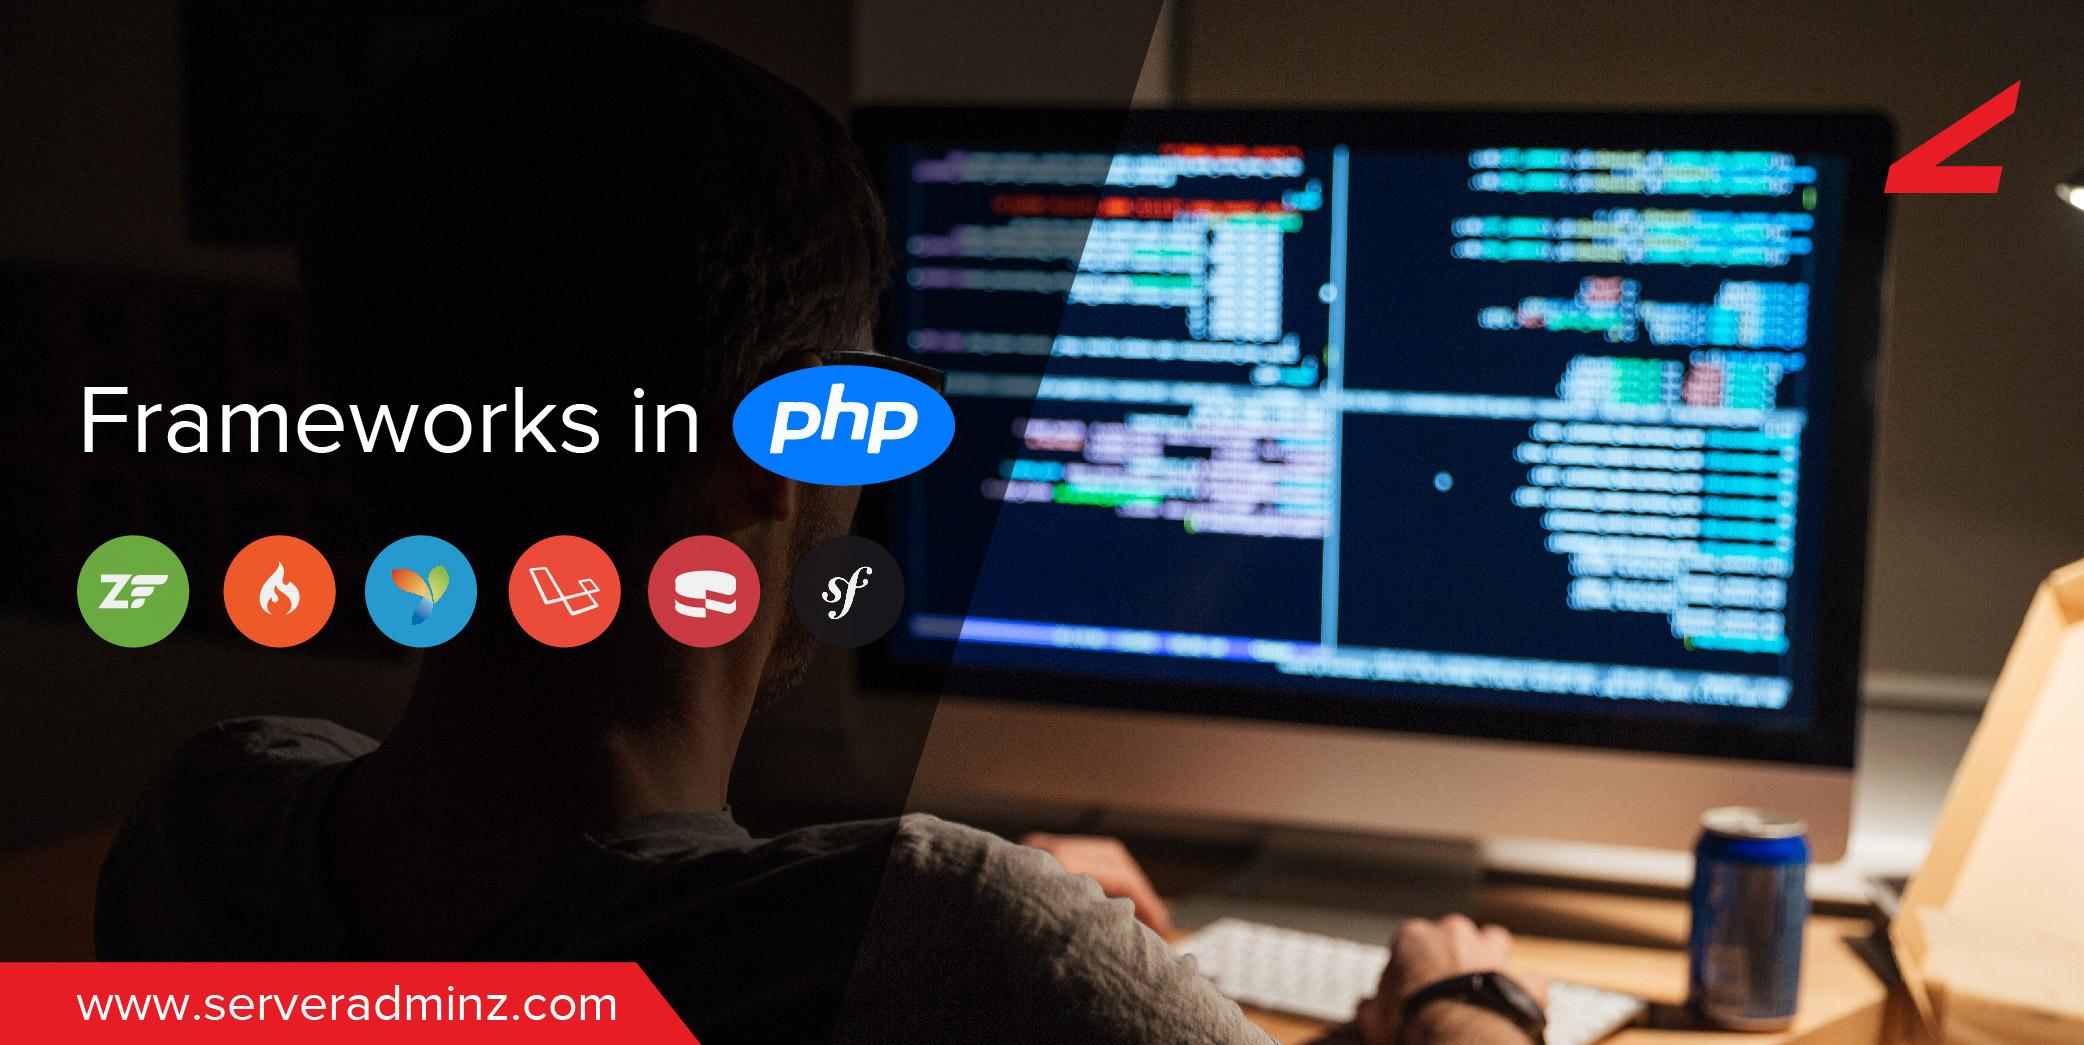 Frameworks in PHP